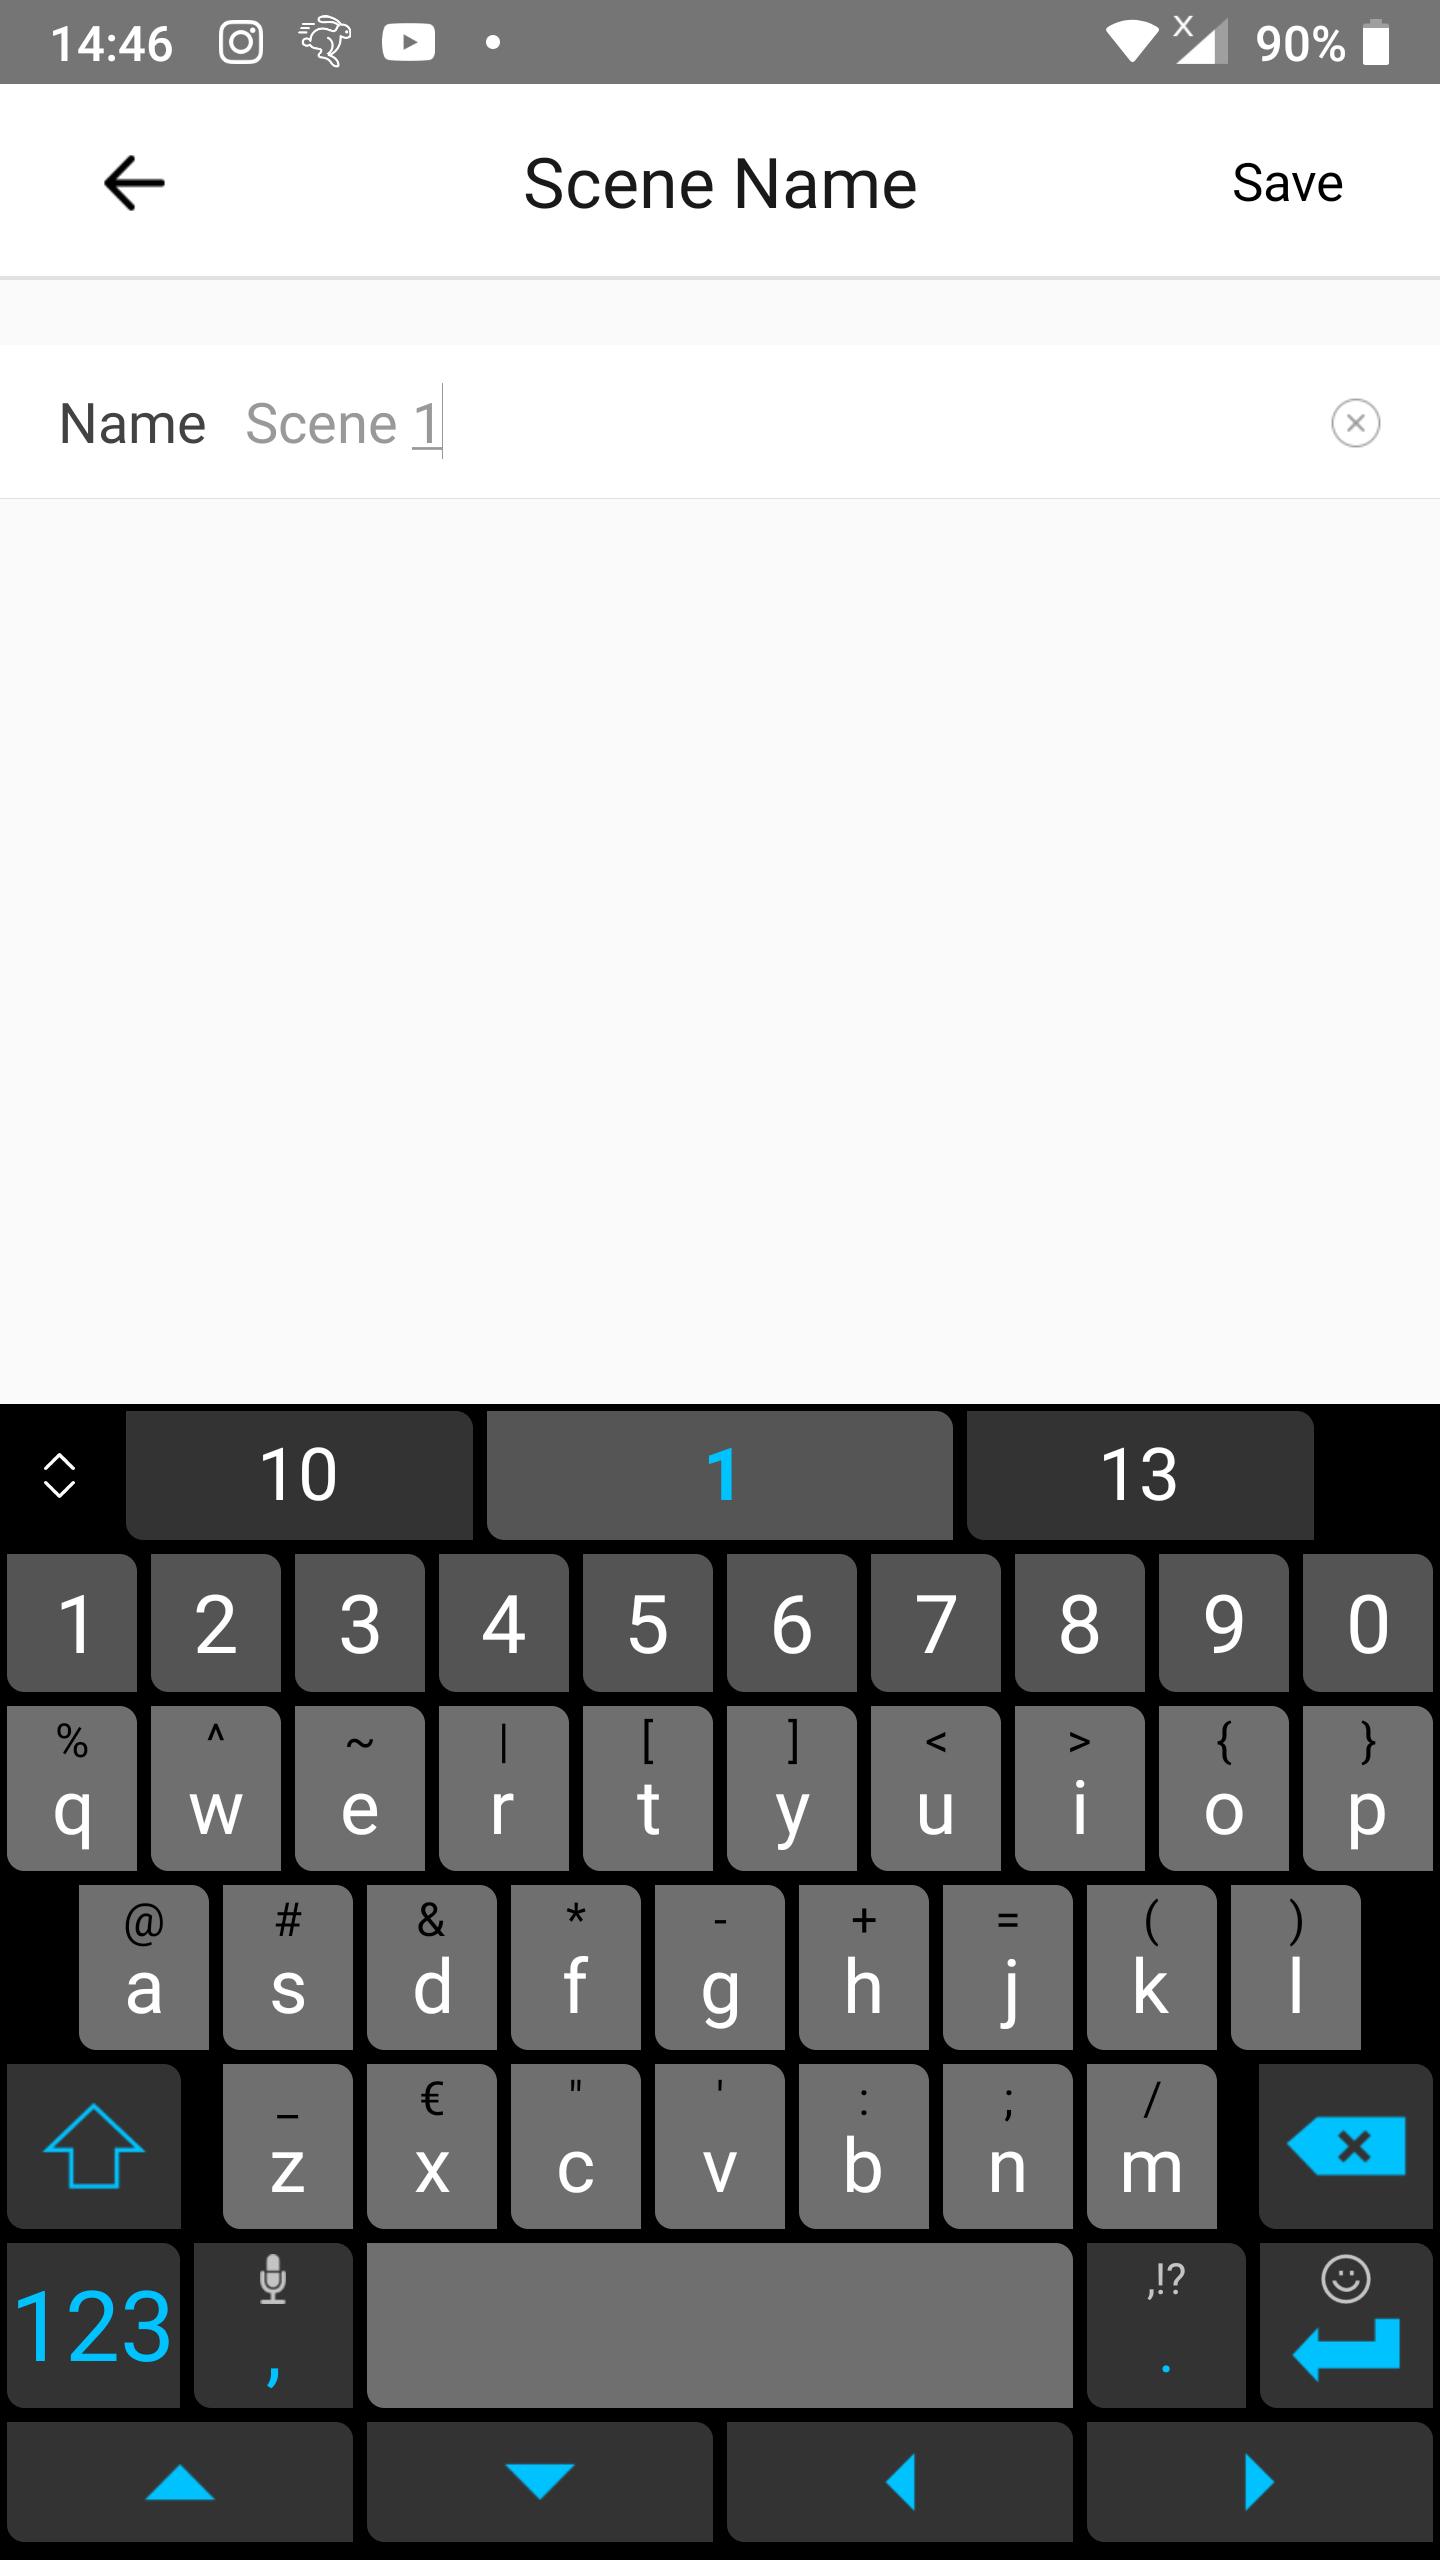 KB: 1-button toggle: Insert scene name